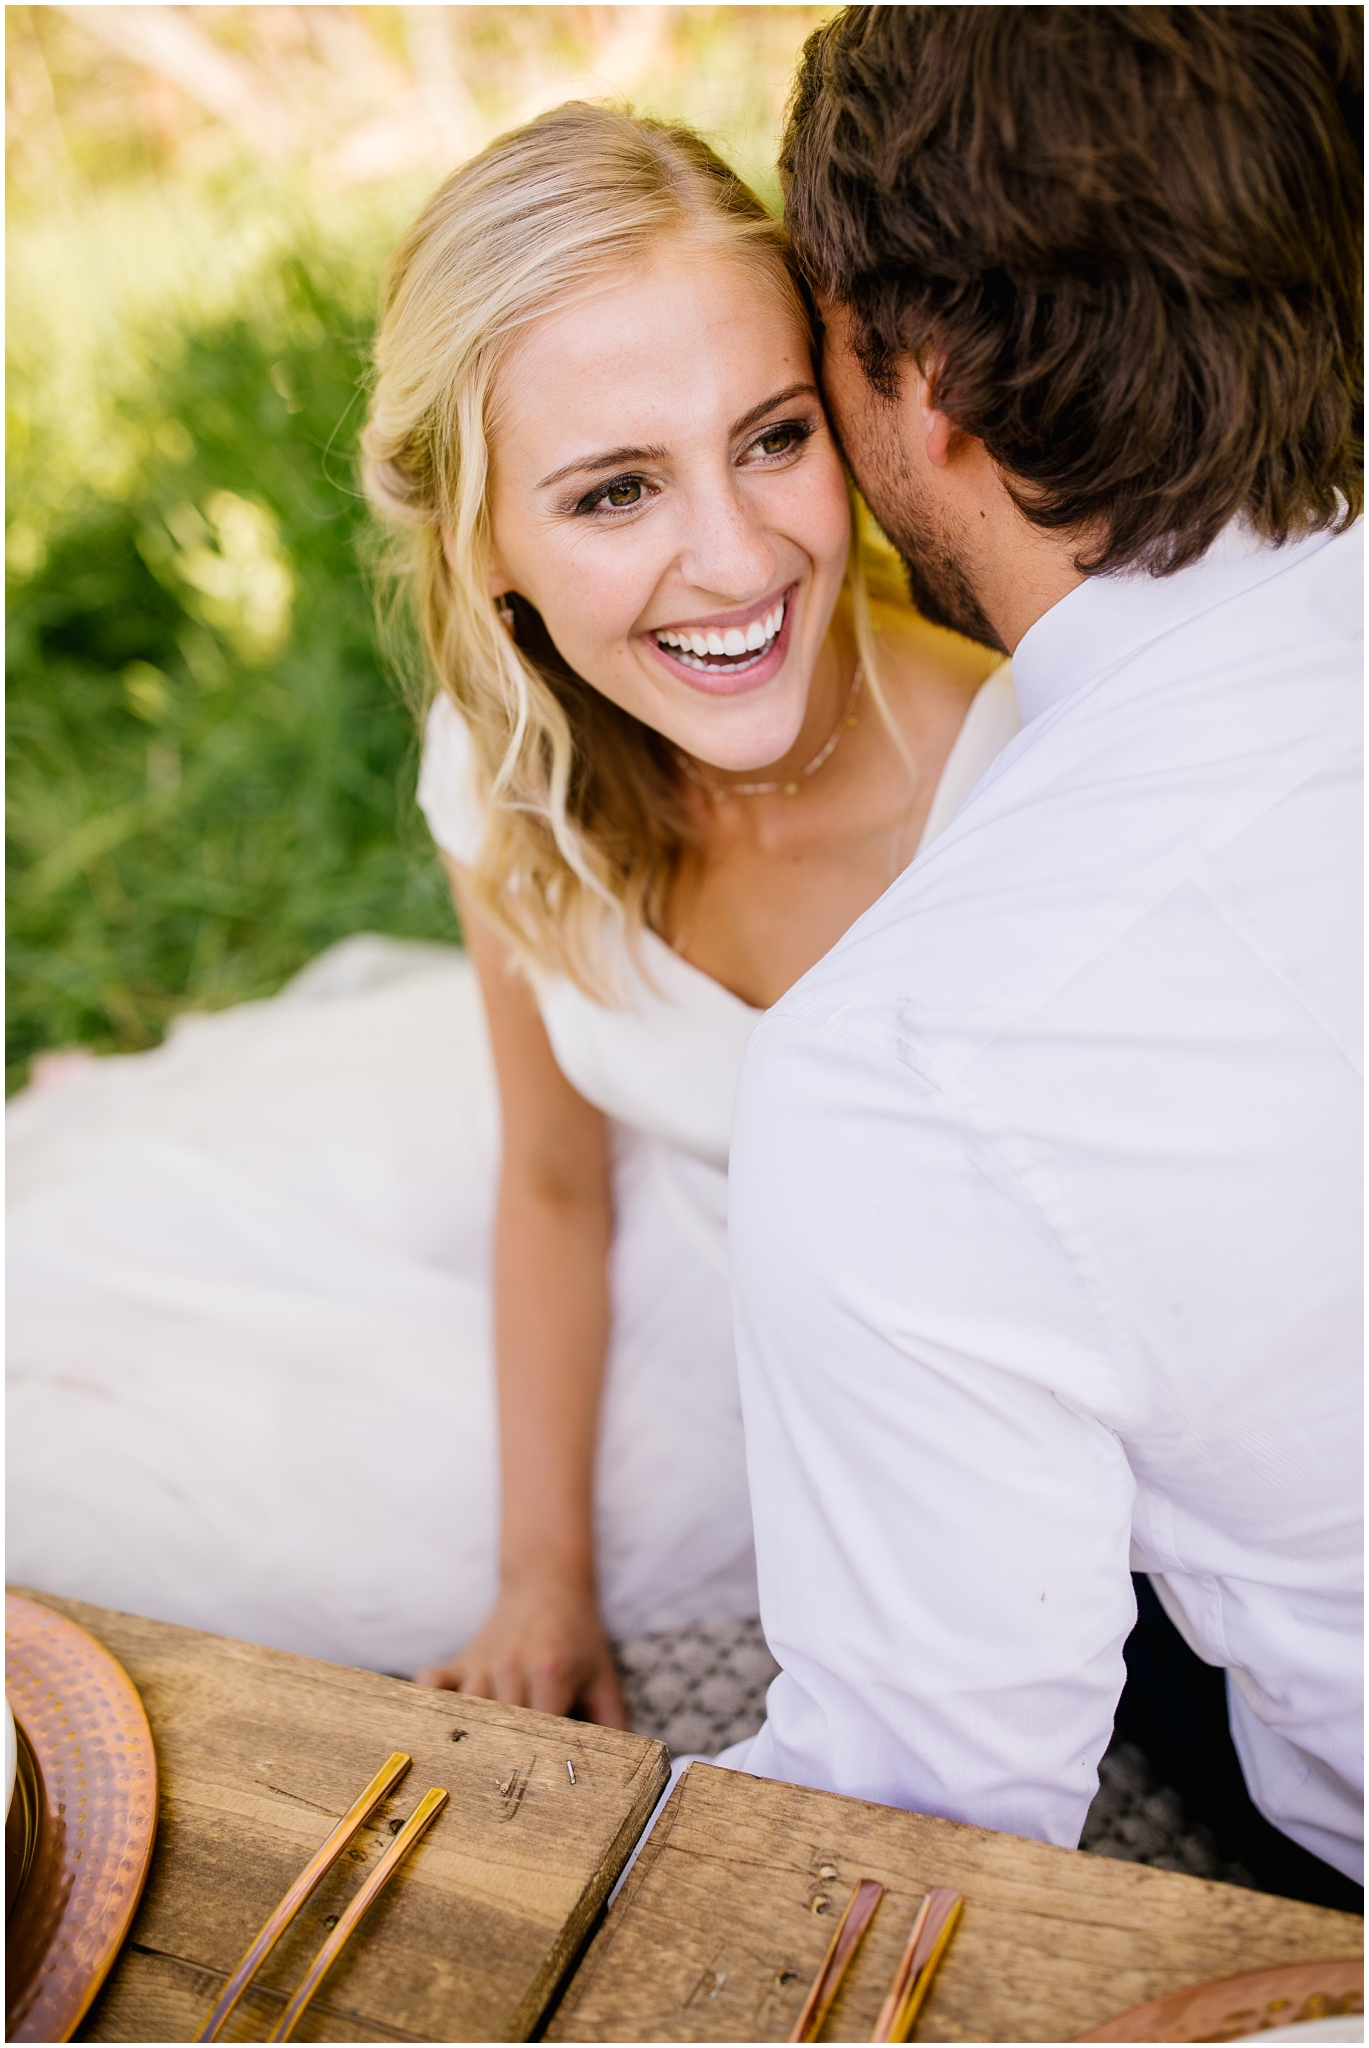 LakeShoot-31_Lizzie-B-Imagery-Utah-Wedding-Photographer-Salt-Lake-City-Park-City-Oakley.jpg